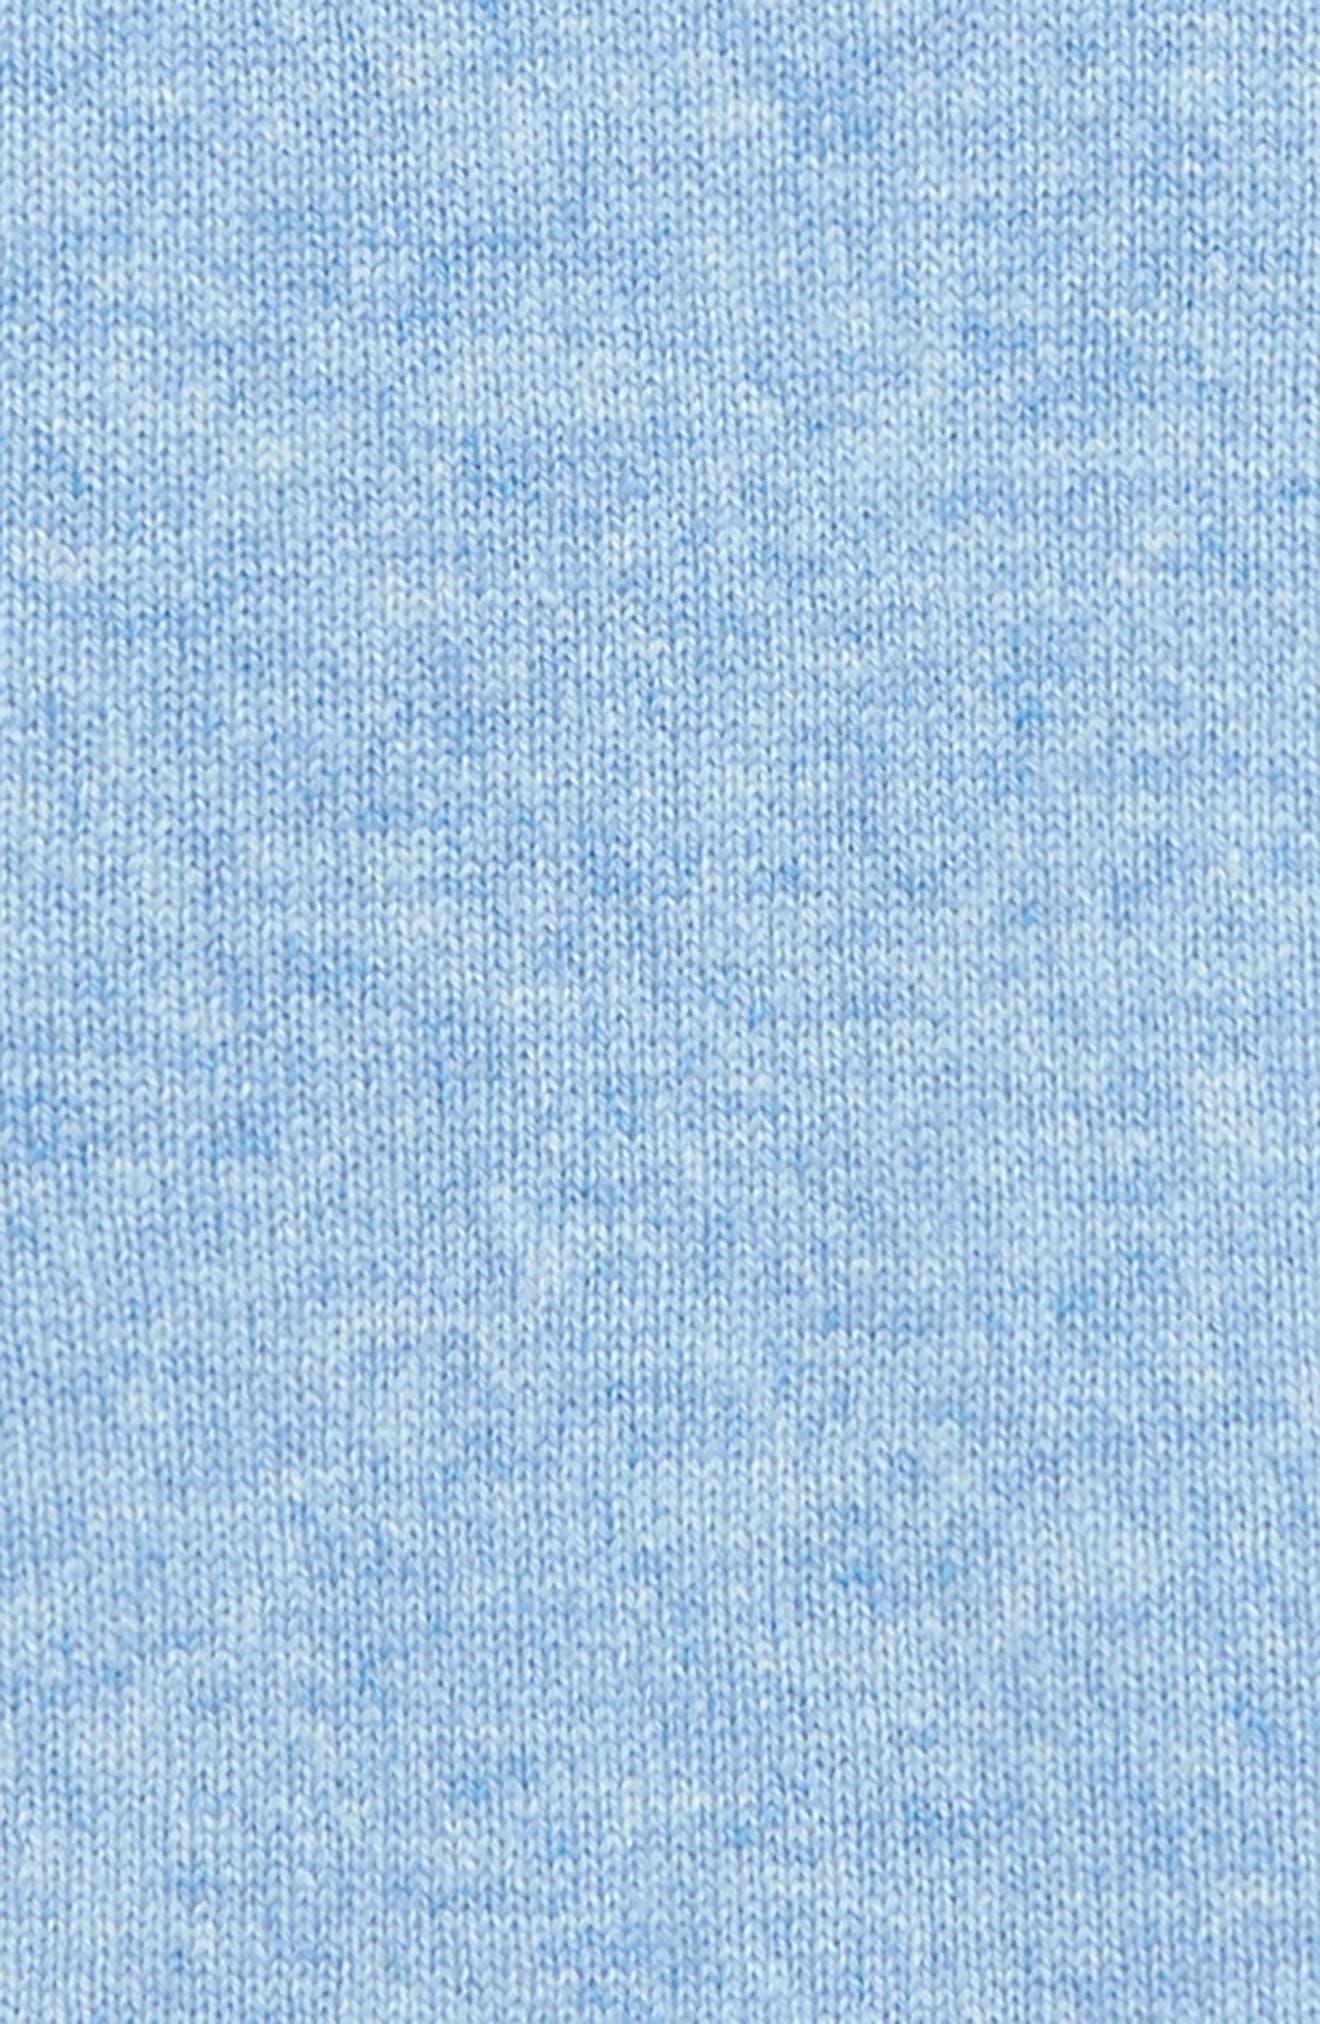 Cashmere Hooded Romper,                             Alternate thumbnail 2, color,                             BLUE WHISPER HEATHER